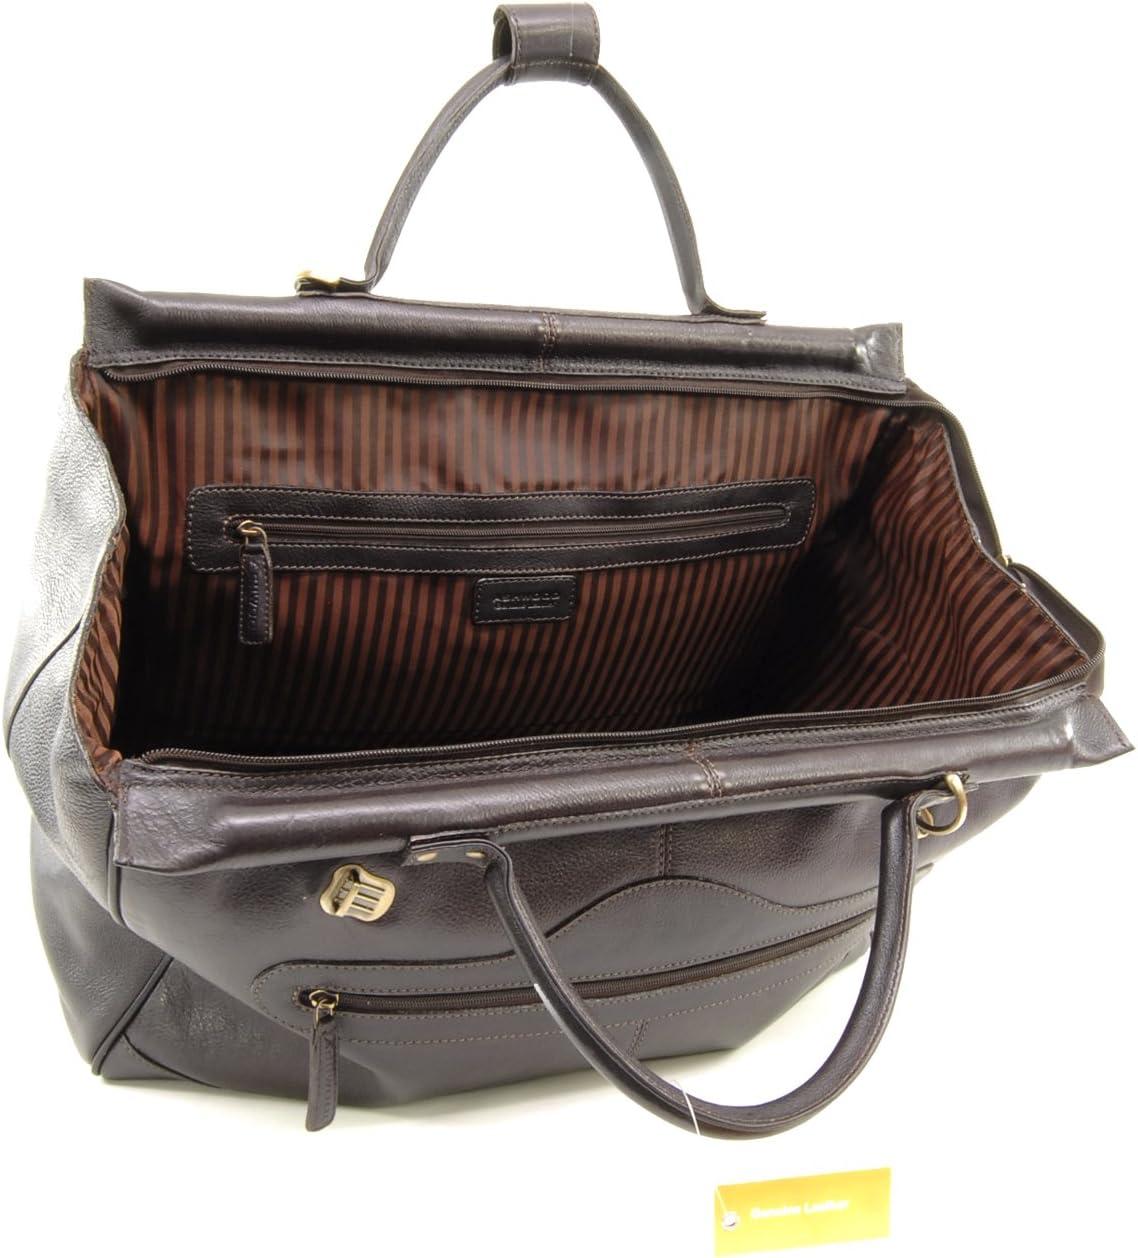 Marron Gladstone Cuir Vintage Texture ASHWOOD Grand Sac de Voyage//Sport//Duffel//Bagages Cabine